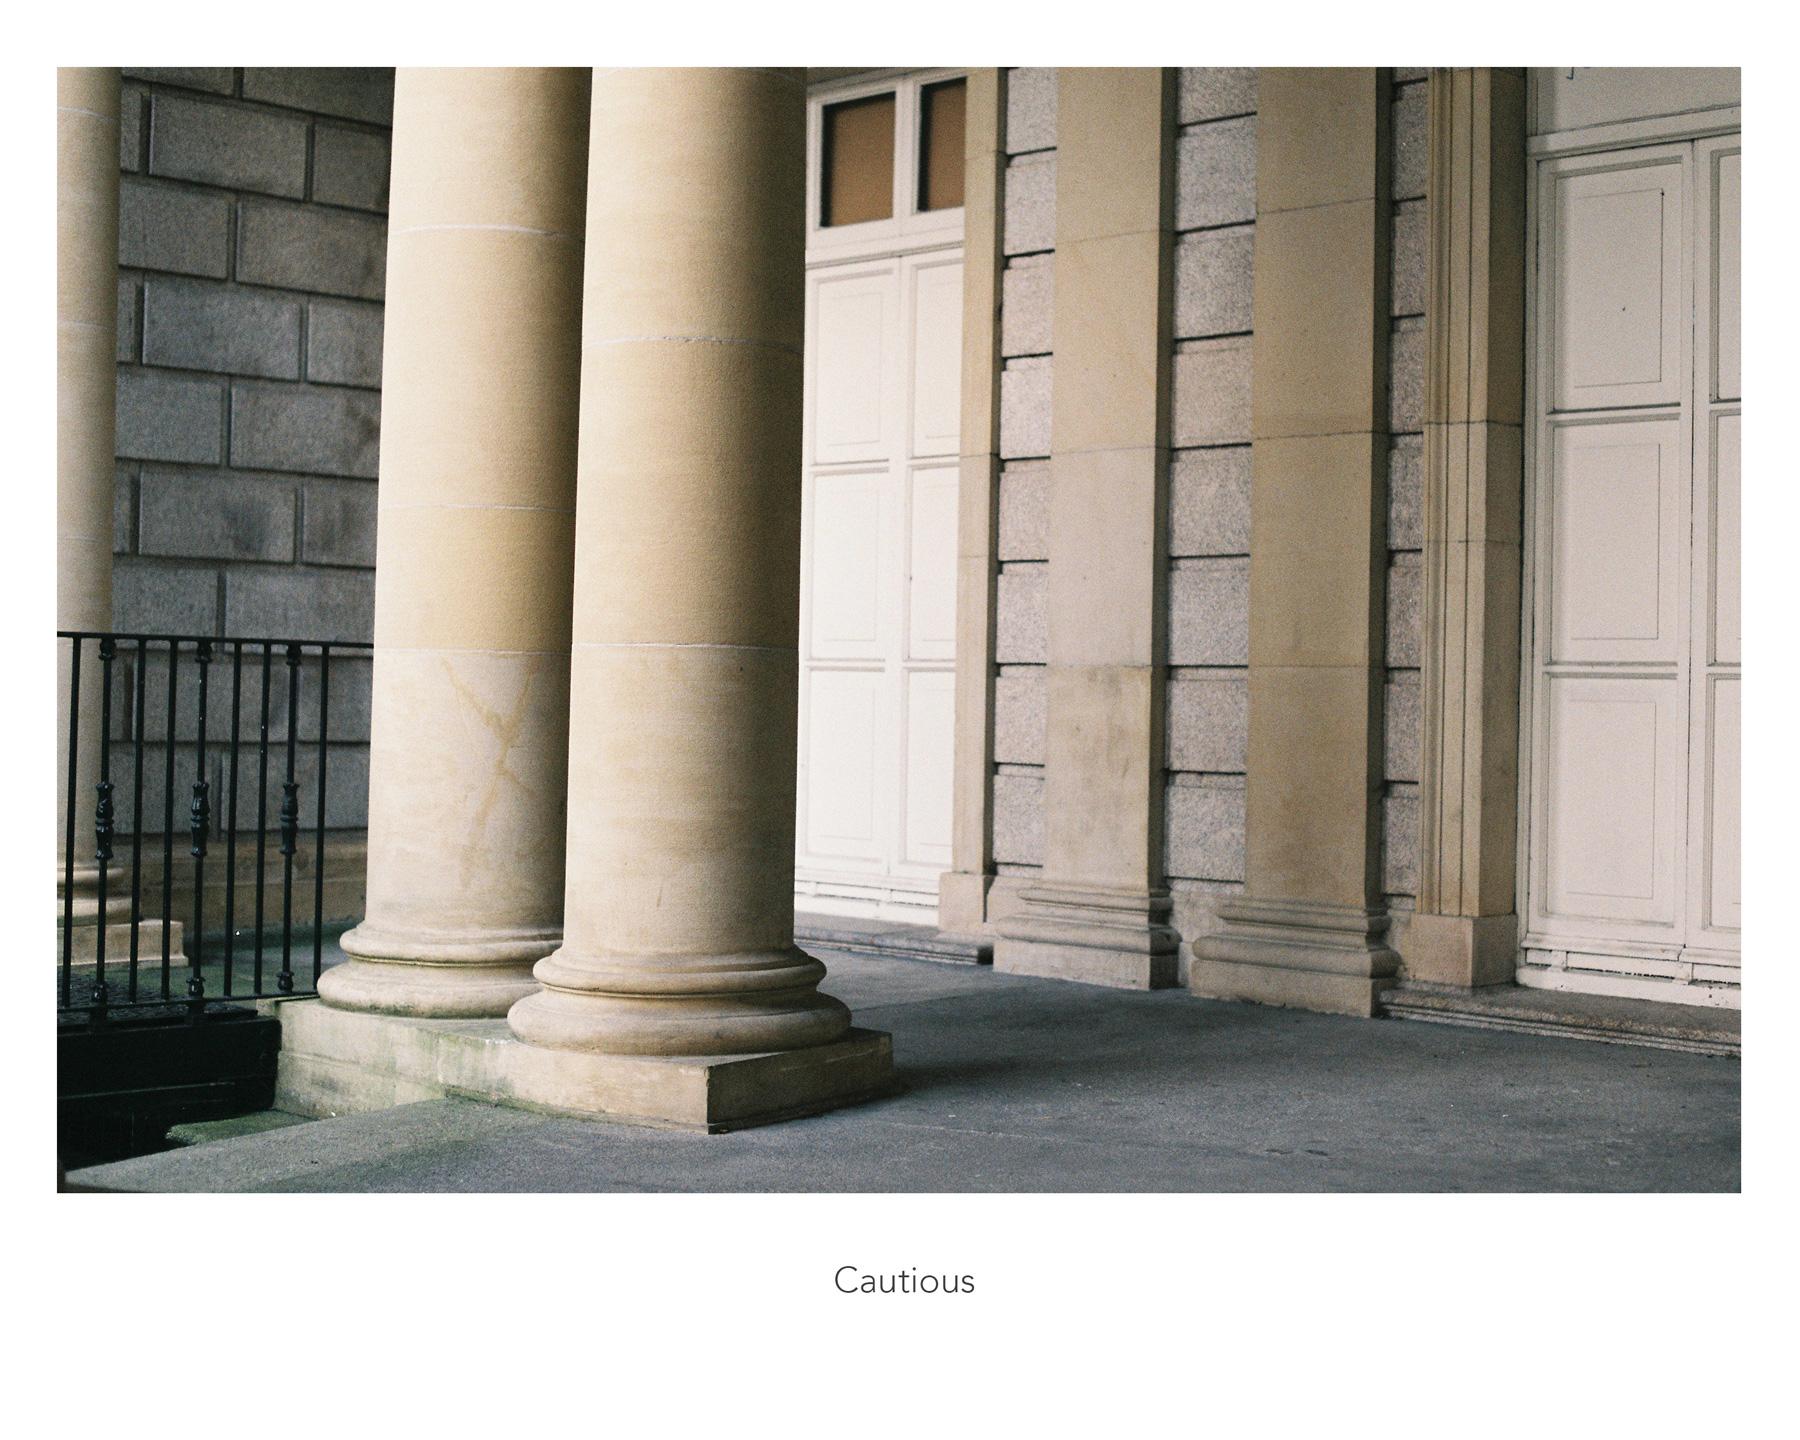 19_cautious.jpg